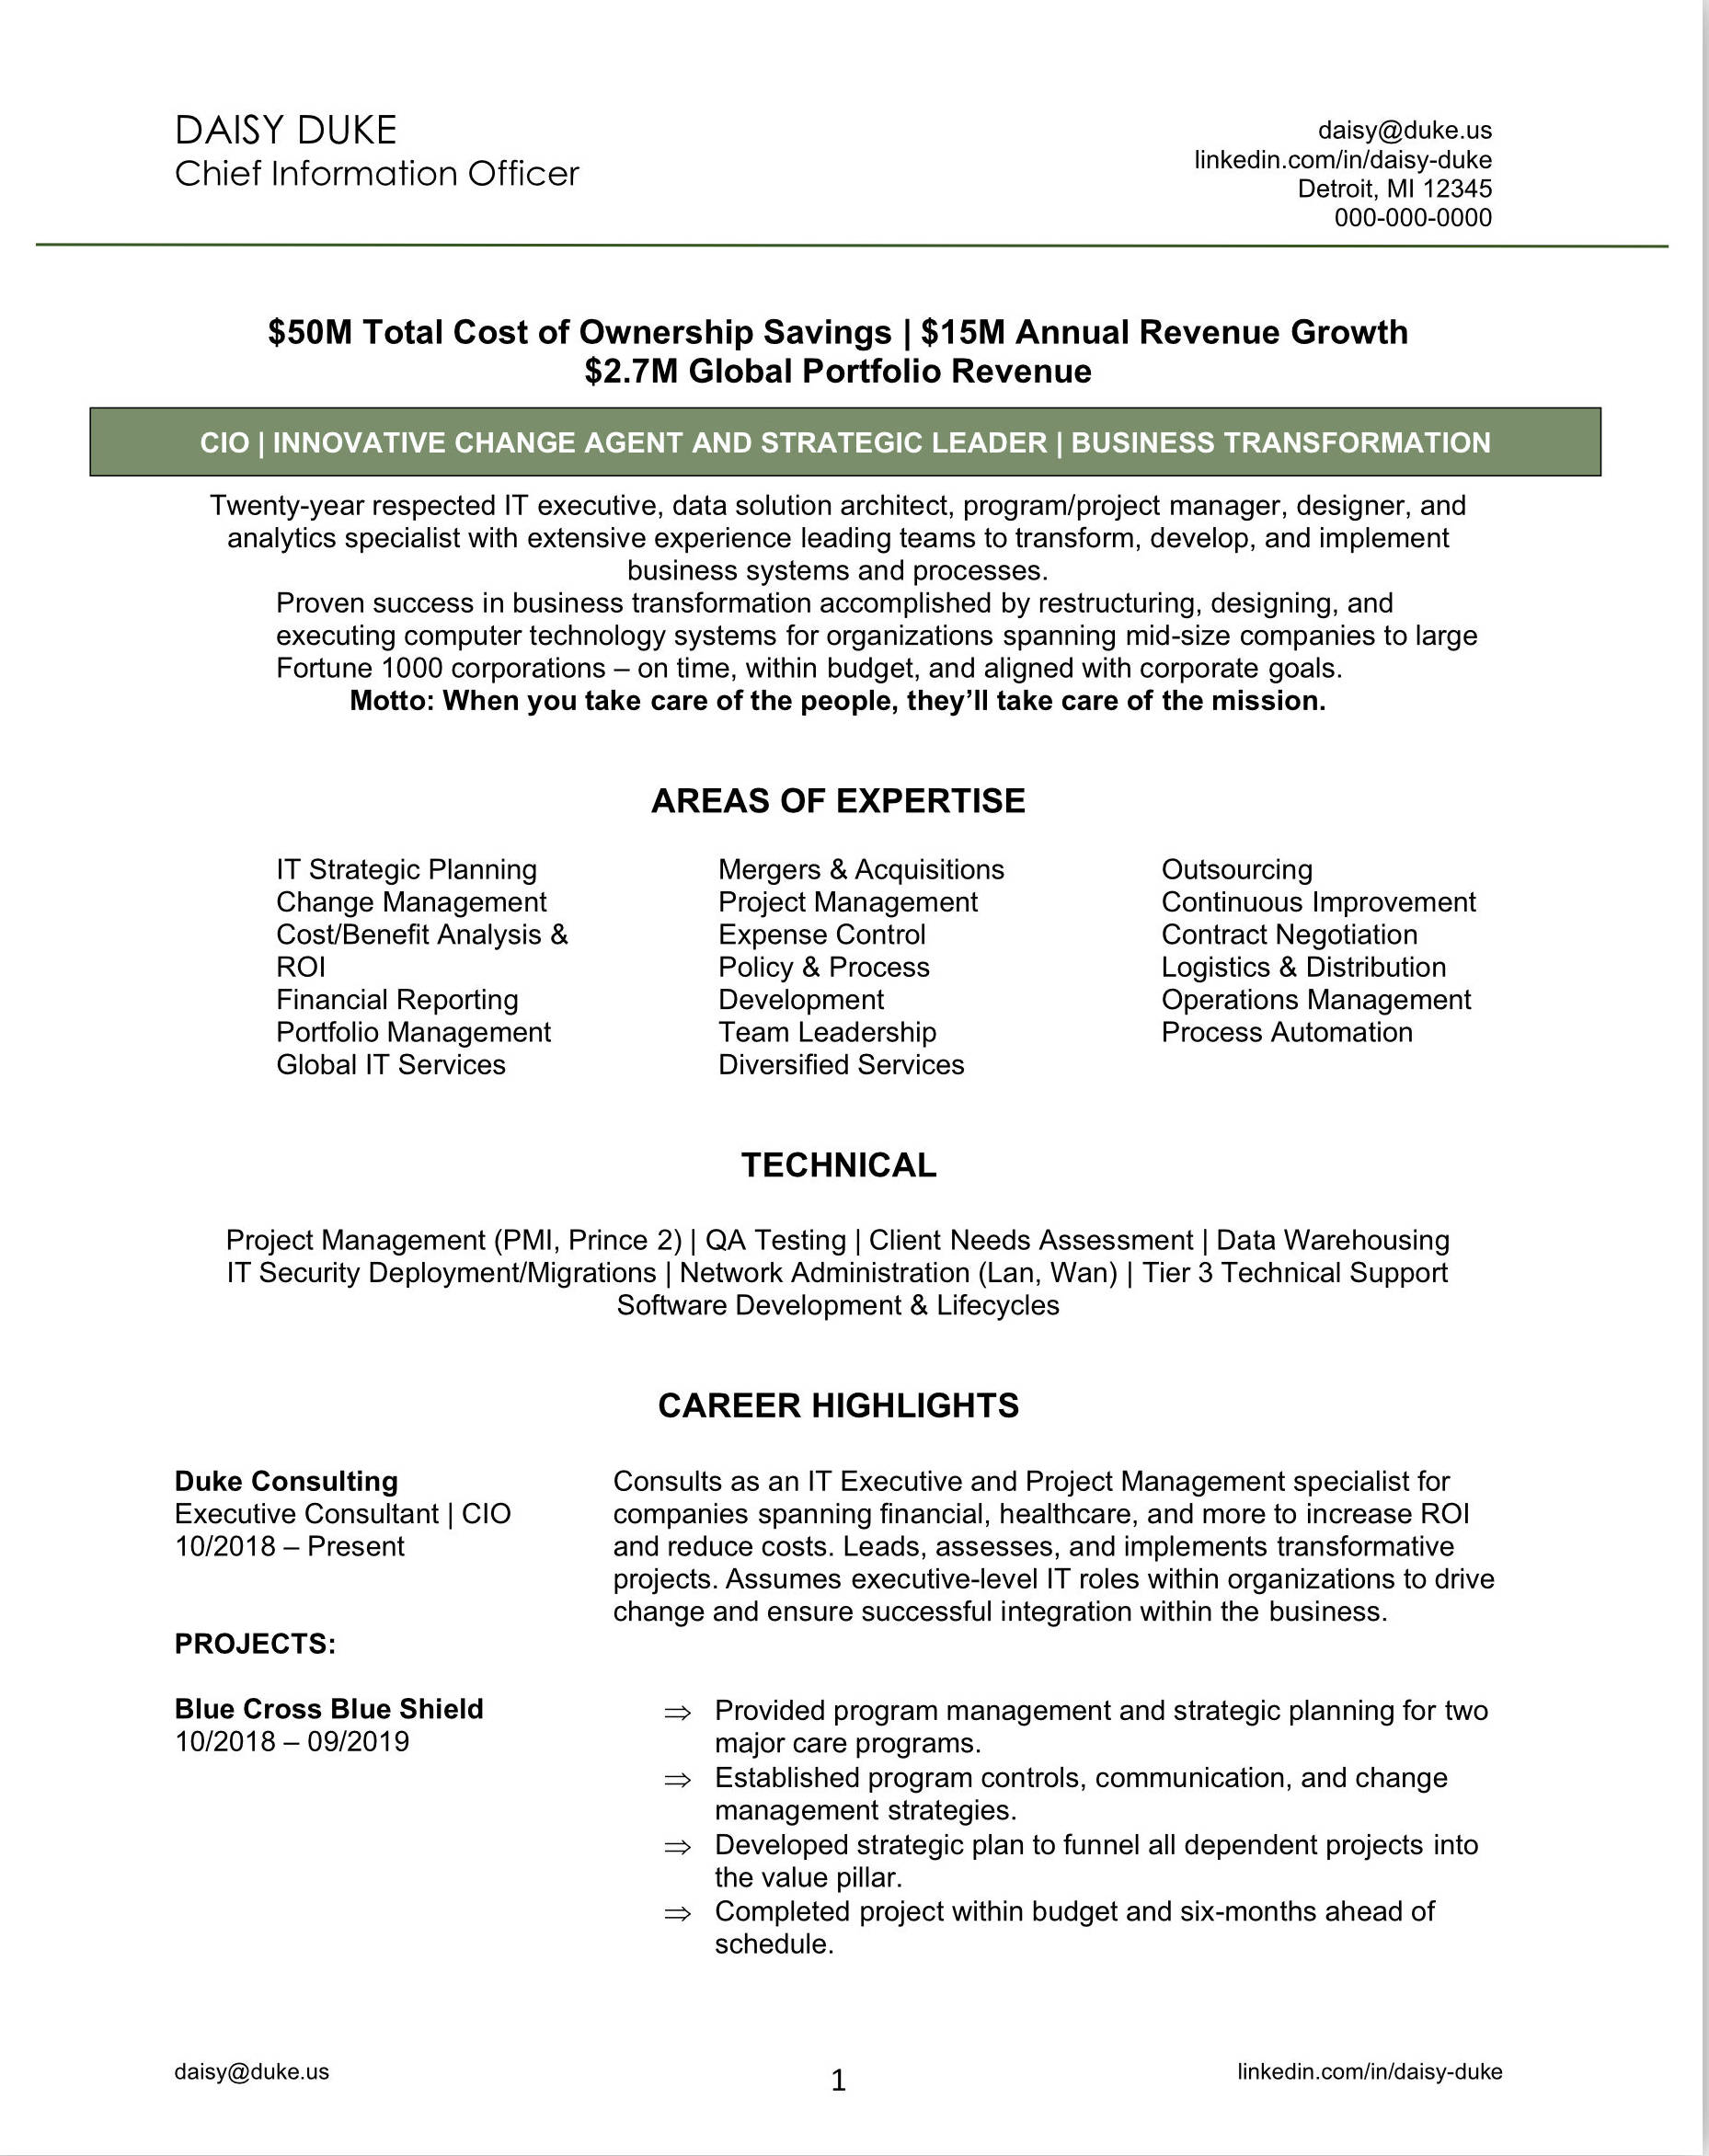 Resume-sample3